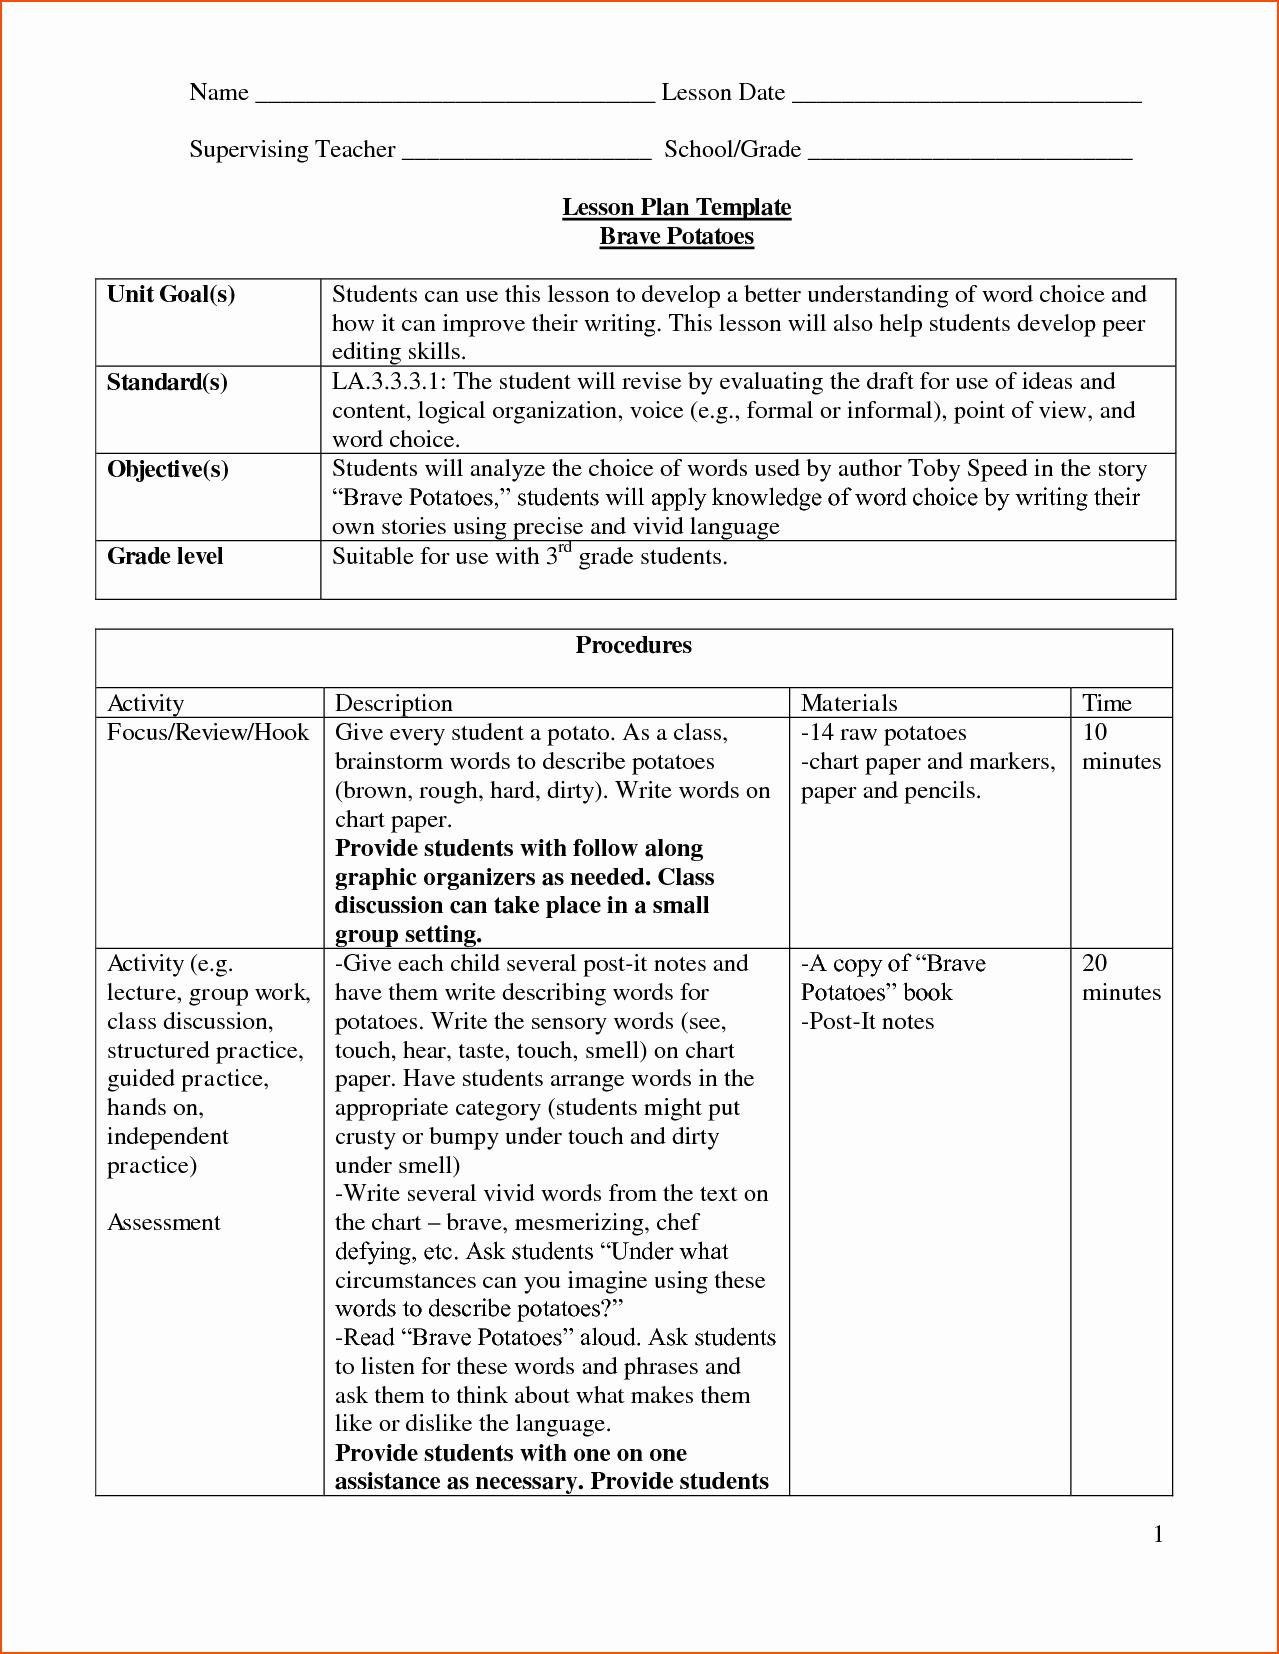 Lesson Plan Template Doc Elegant 8 Lesson Plan Template Doc Bookletemplate